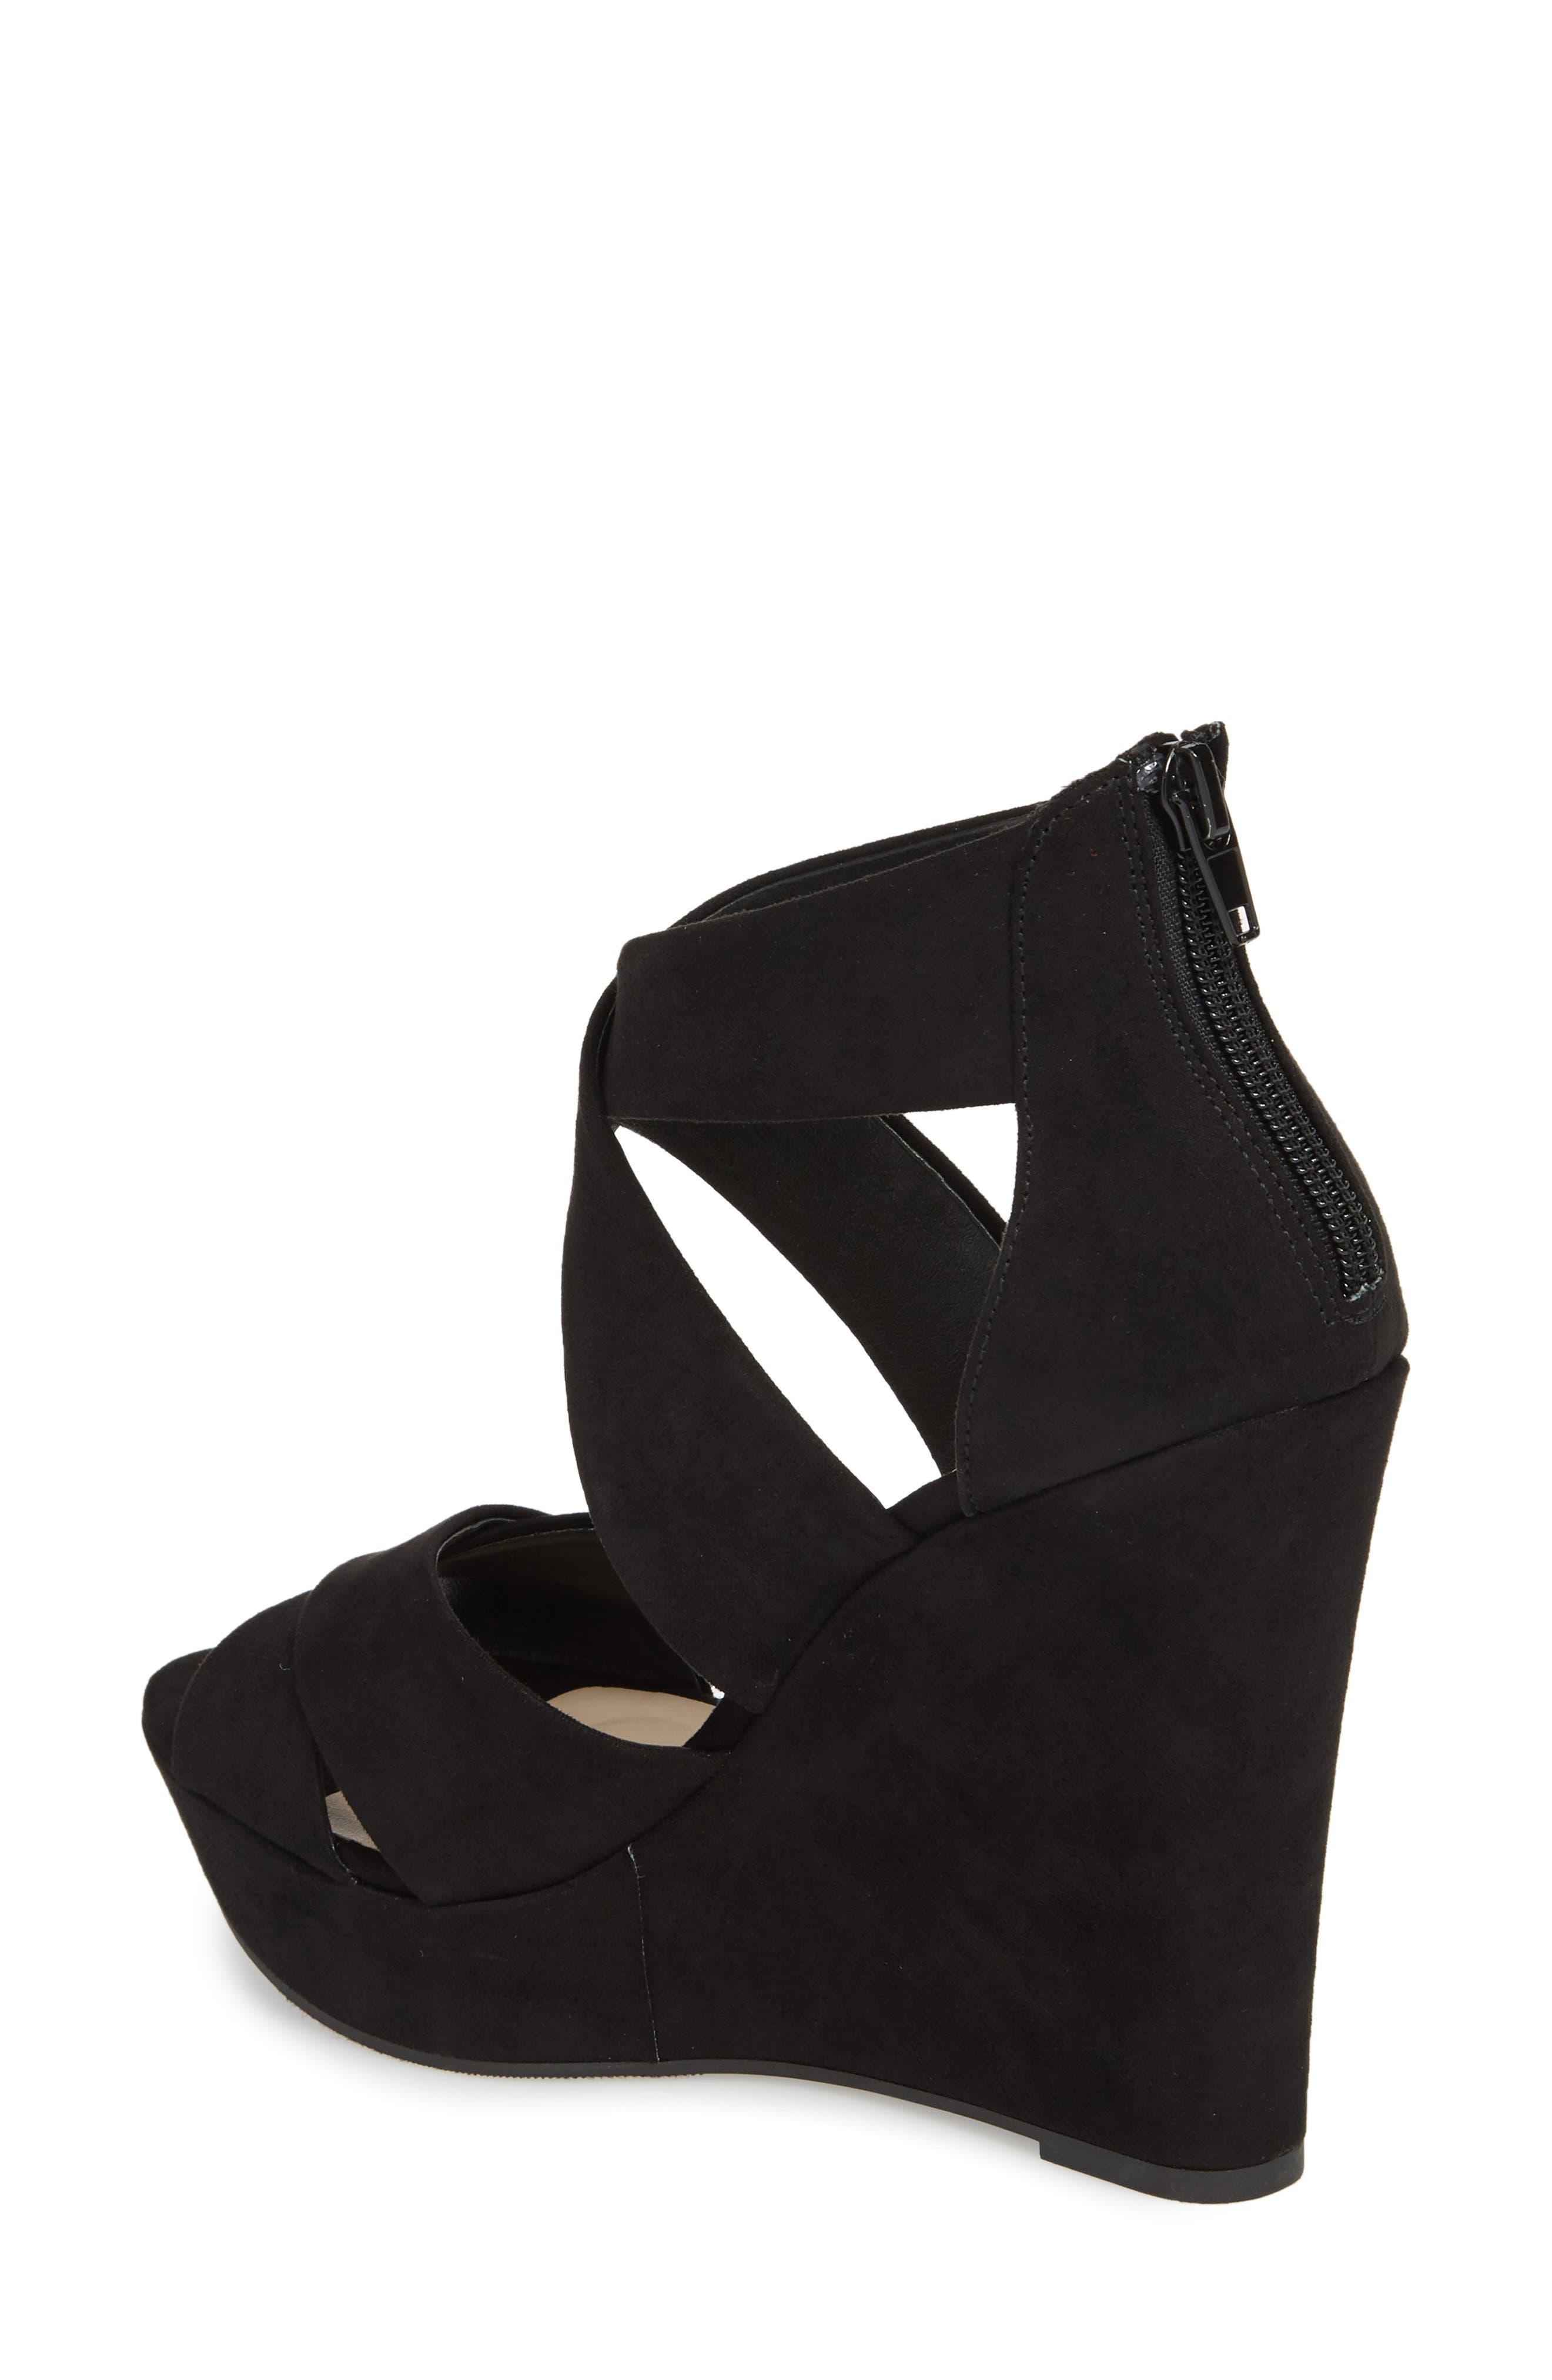 Milani Platform Wedge Sandal,                             Alternate thumbnail 2, color,                             BLACK